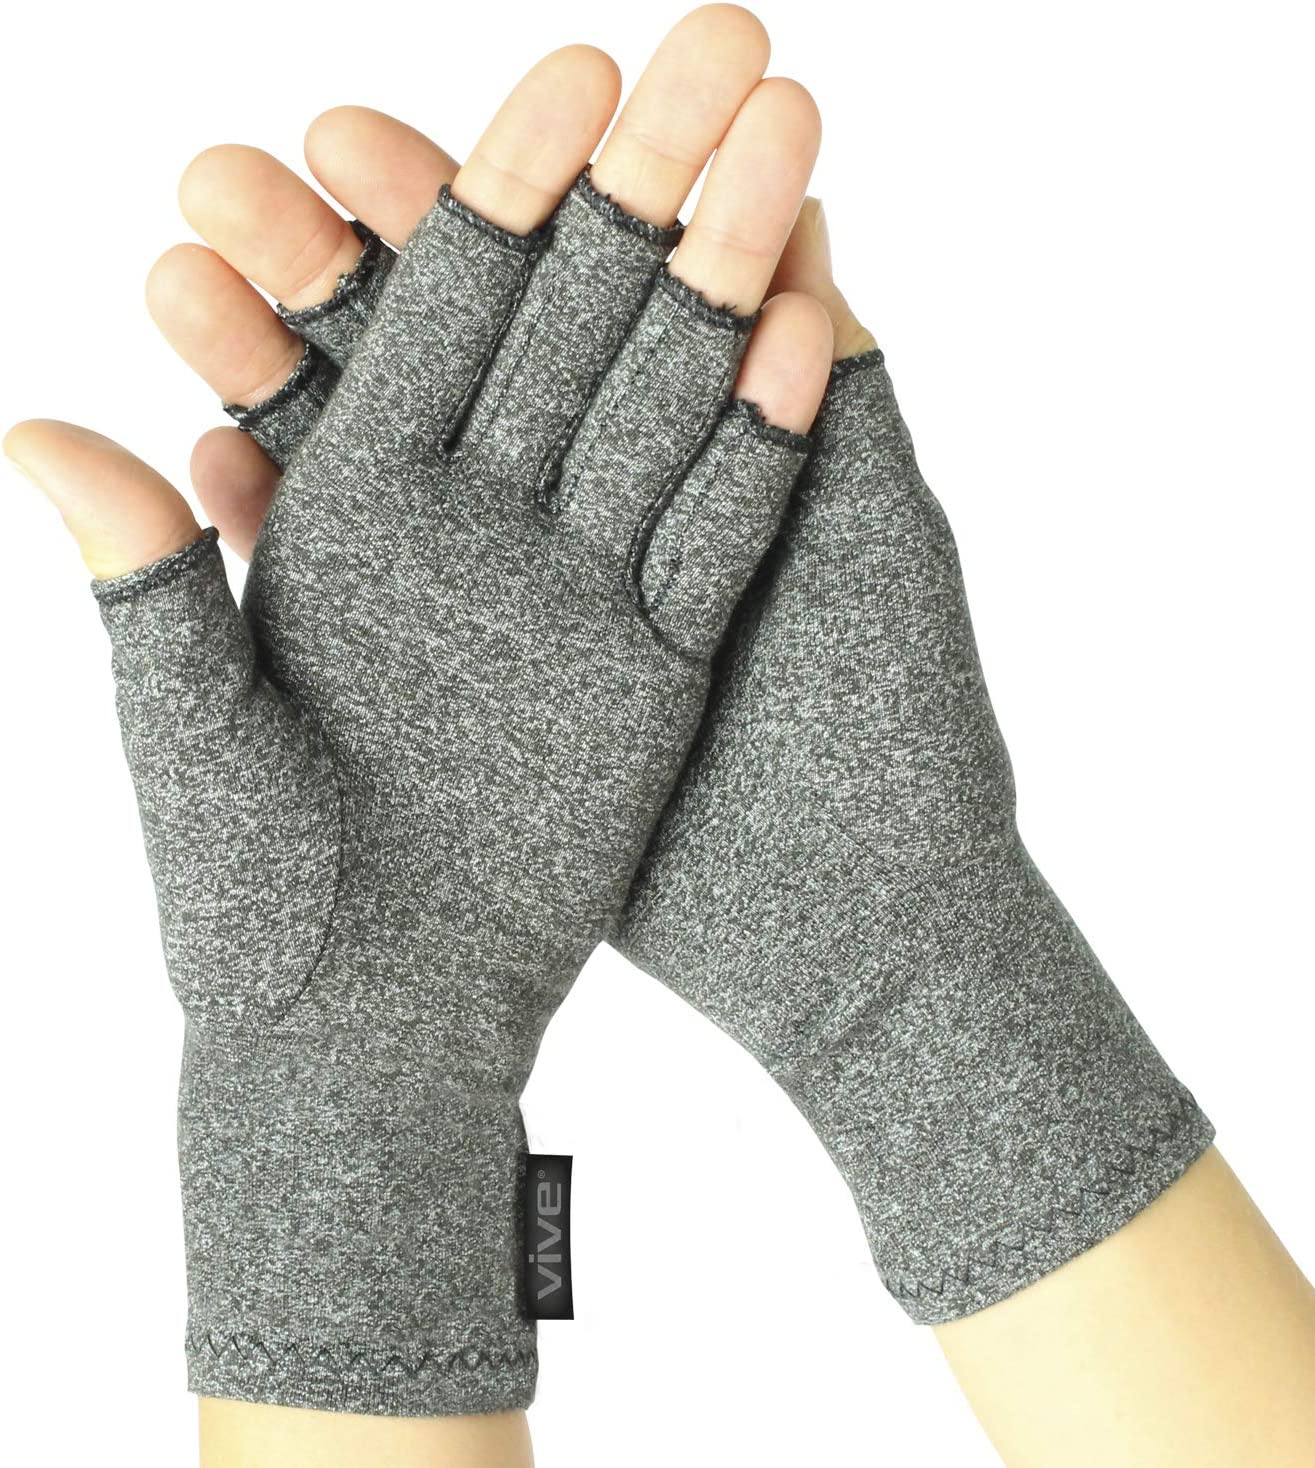 Large Compression Arthritis Gloves Women Men Compression Gloves for Arthritis Pain Relief Compression Arthritis Gloves for Women Arthritis Hands